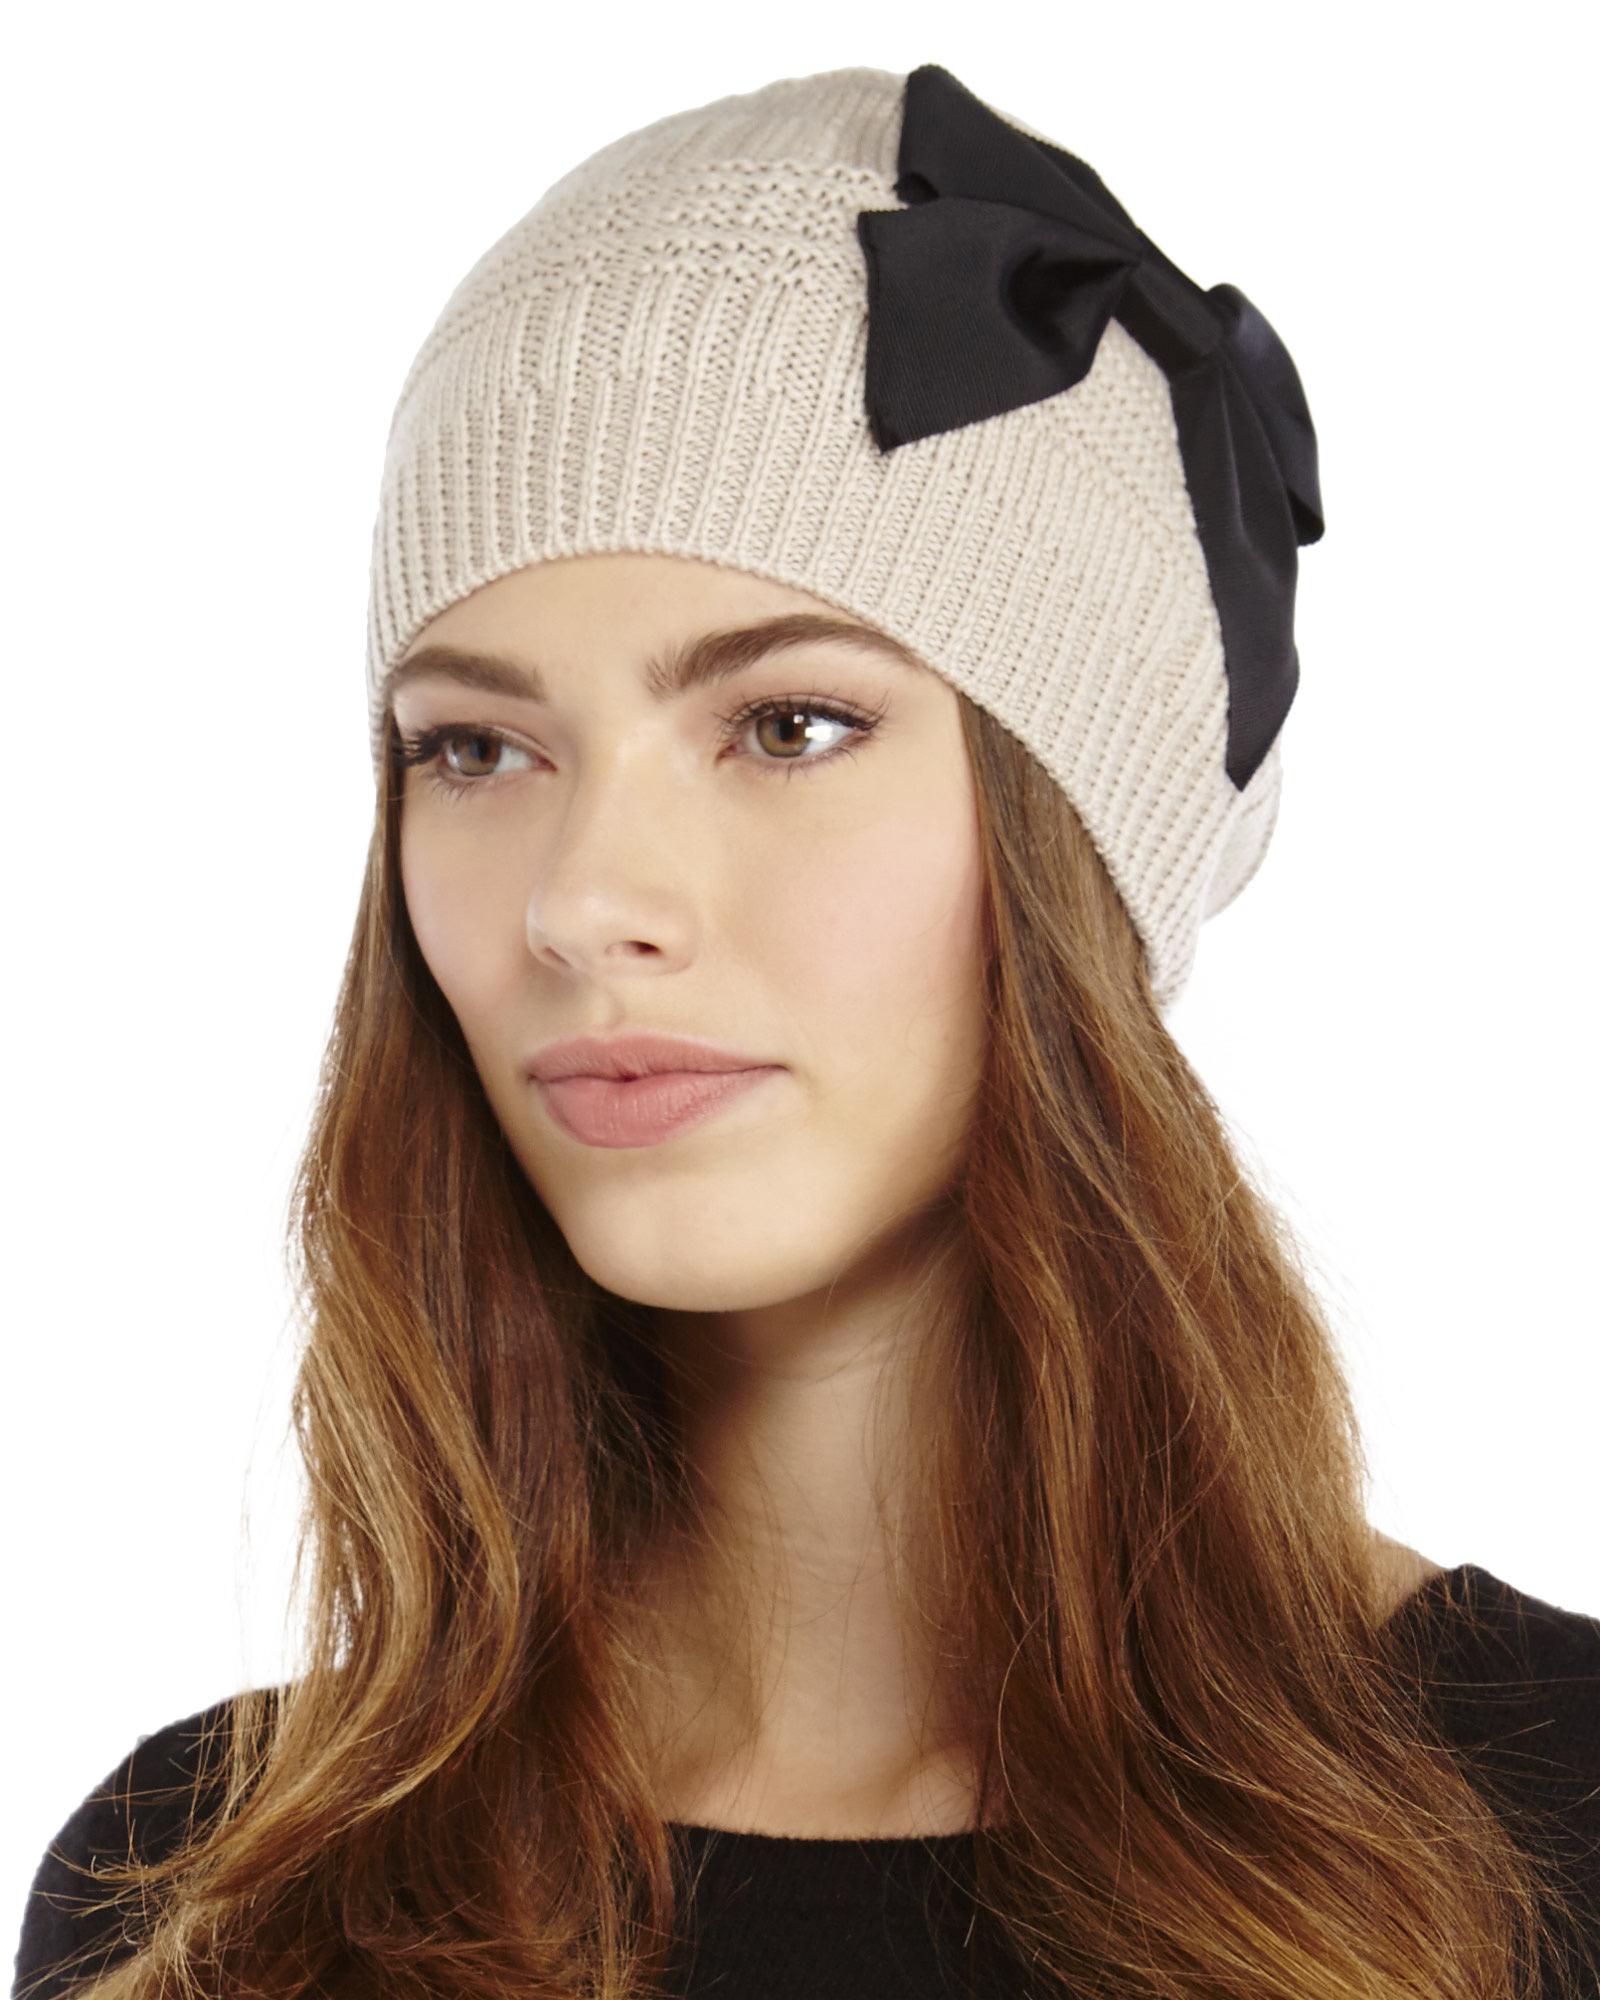 Lyst - Kate Spade Plaid Stitch Bow Beanie in Black 7ccfb8241c9